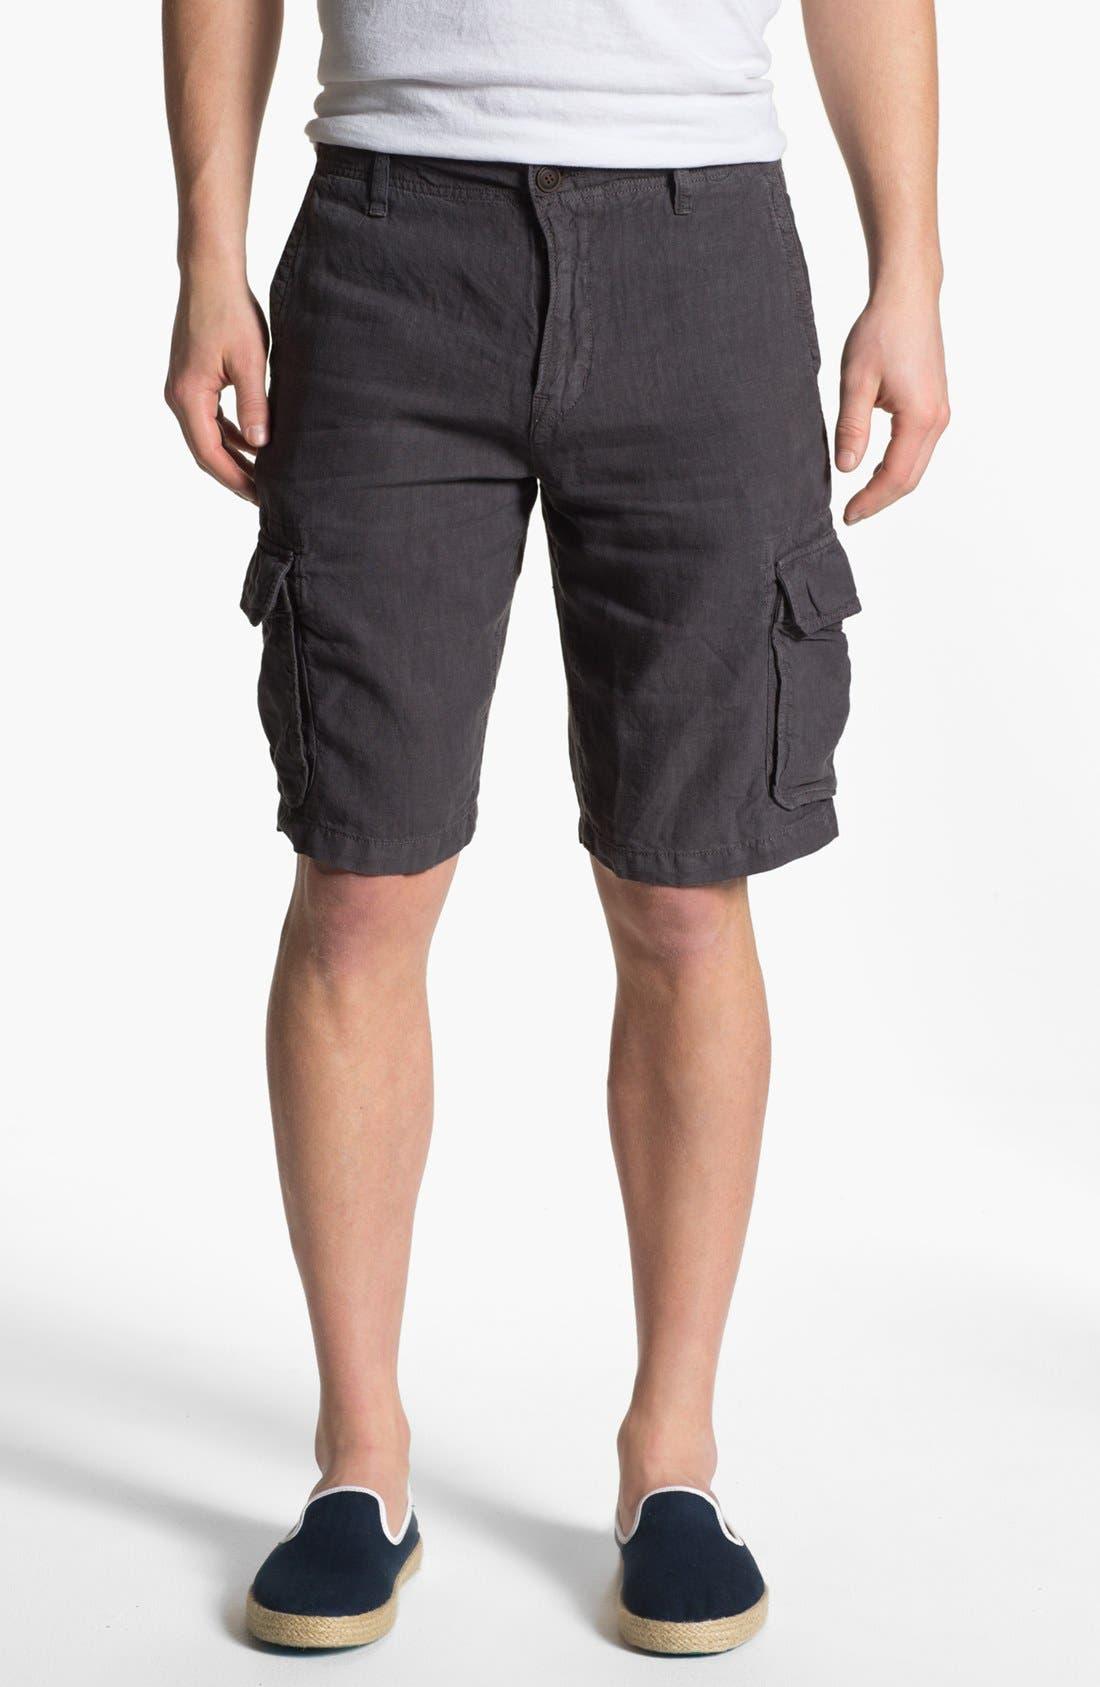 Alternate Image 1 Selected - Lucky Brand 'Long Beach' Linen Cargo Shorts